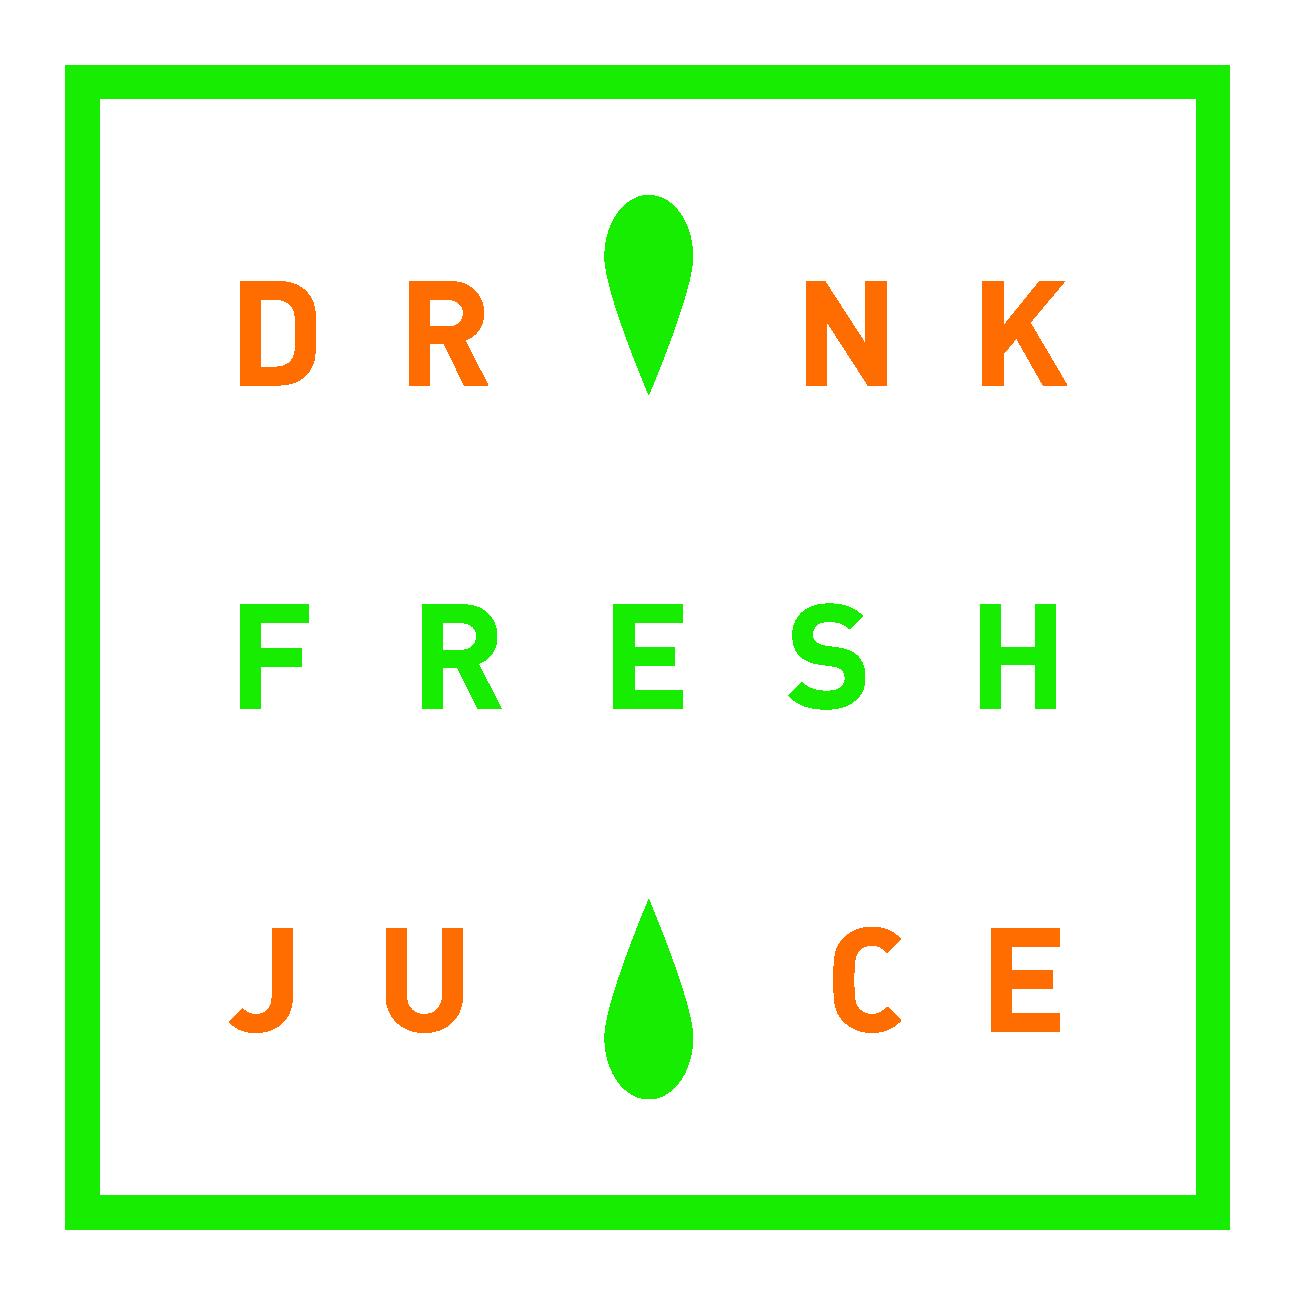 Drink_Fresh_Juice_logo_1296px